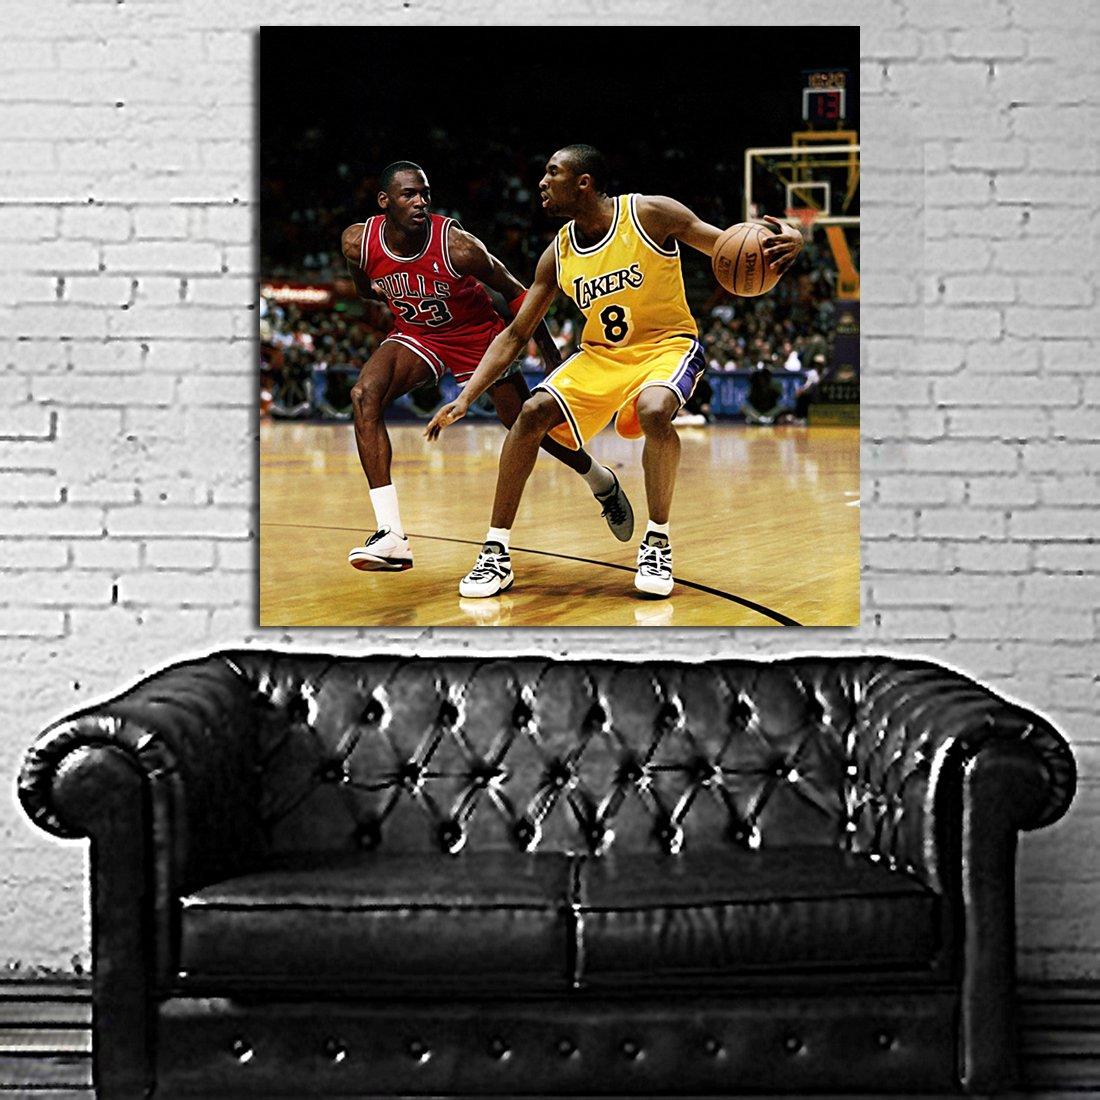 #22 Poster Mural Kobe Bryant Michael Jordan Basketball 40x40 inch (100x100 cm) on Adhesive Vinyl #22 by SDK mural